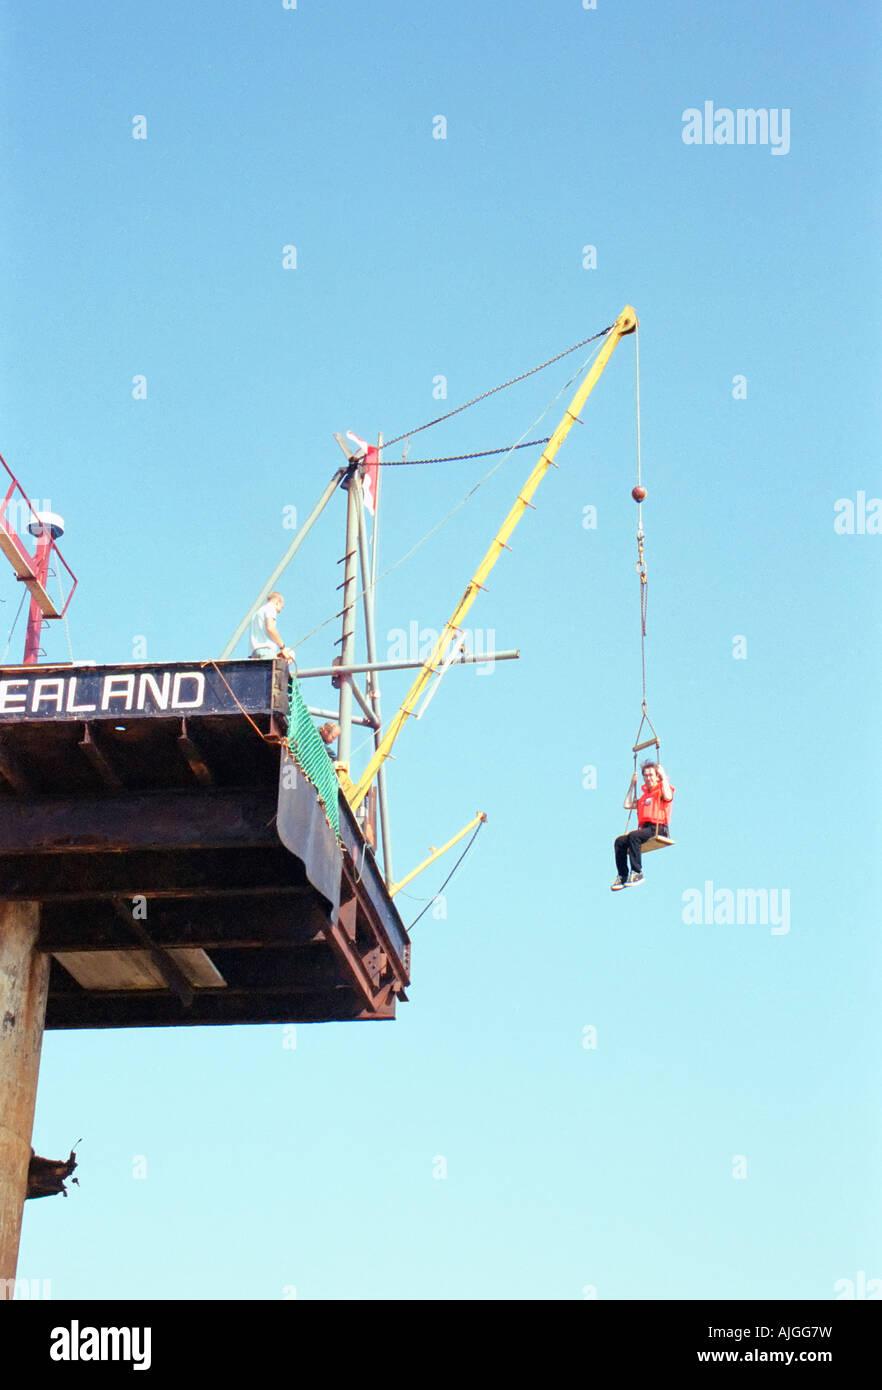 The Principality of Sealand, a micronation 12 nautical miles from the British coast. Stock Photo